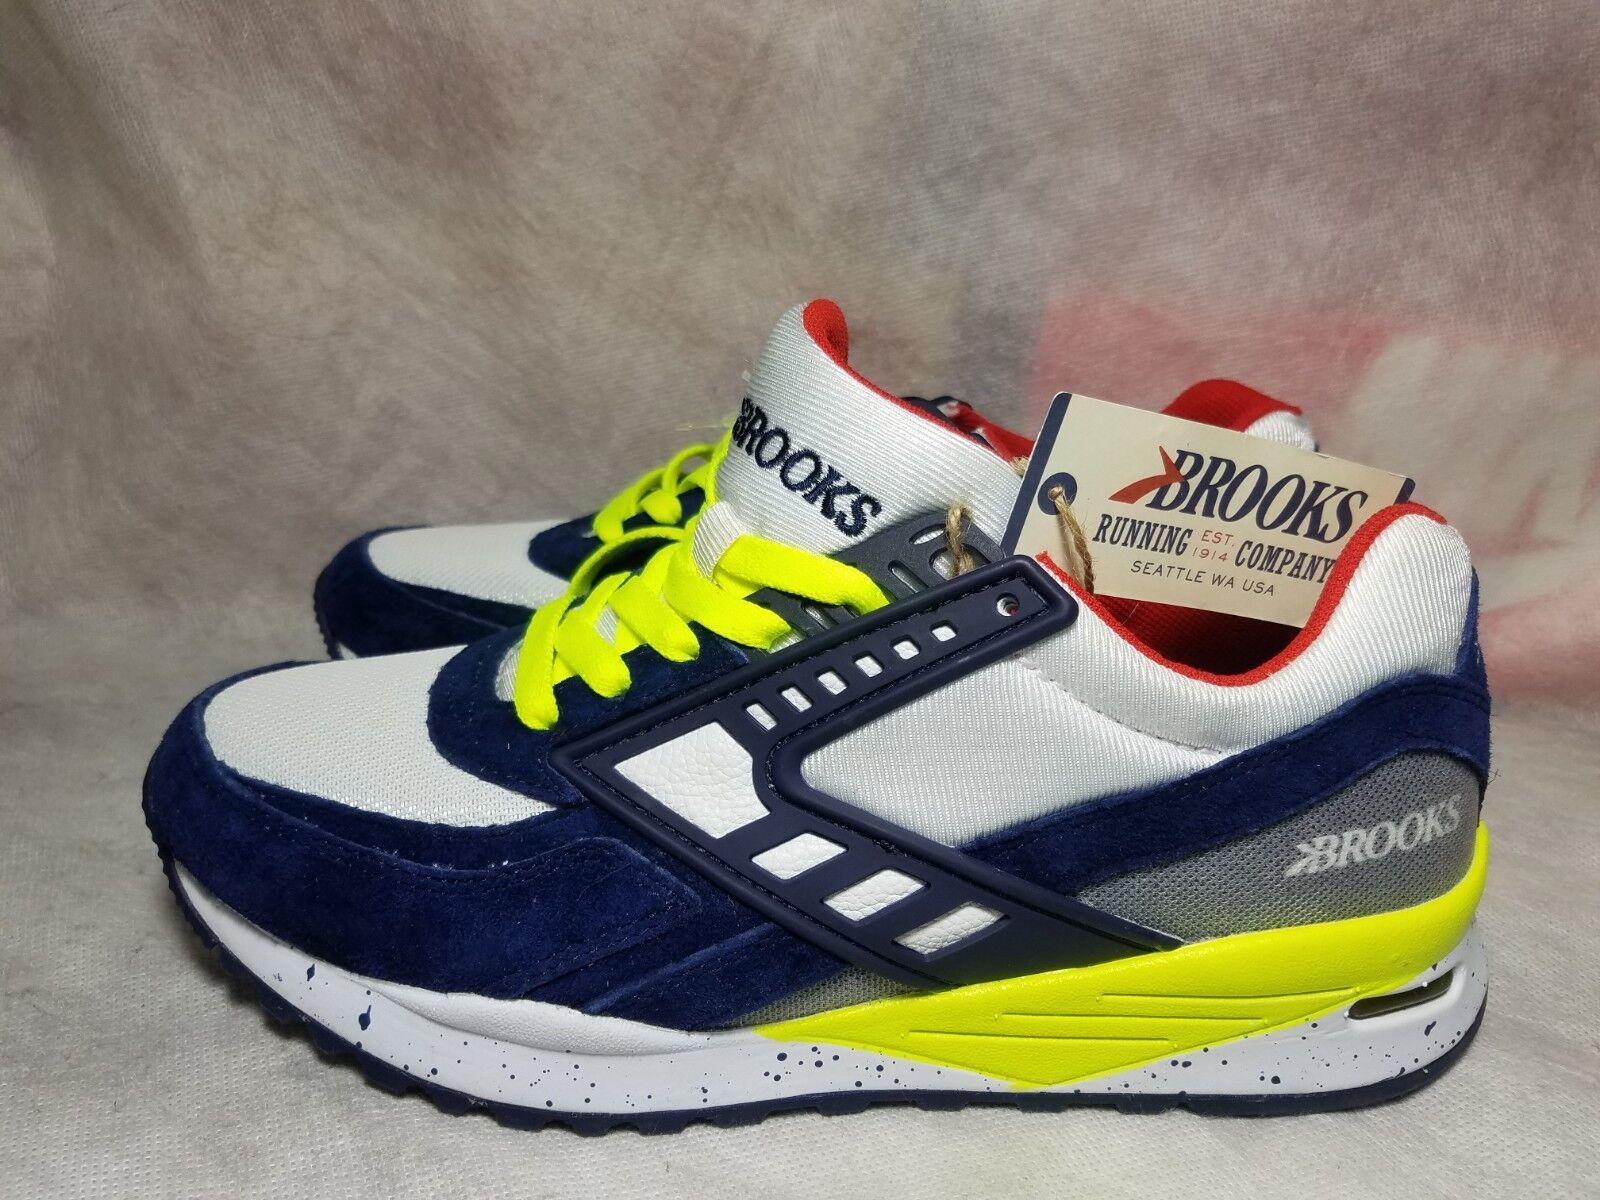 New Brooks Beast City Regent Uomo Size 7 Blue Suede Volt Red Outdoor Running Shoe